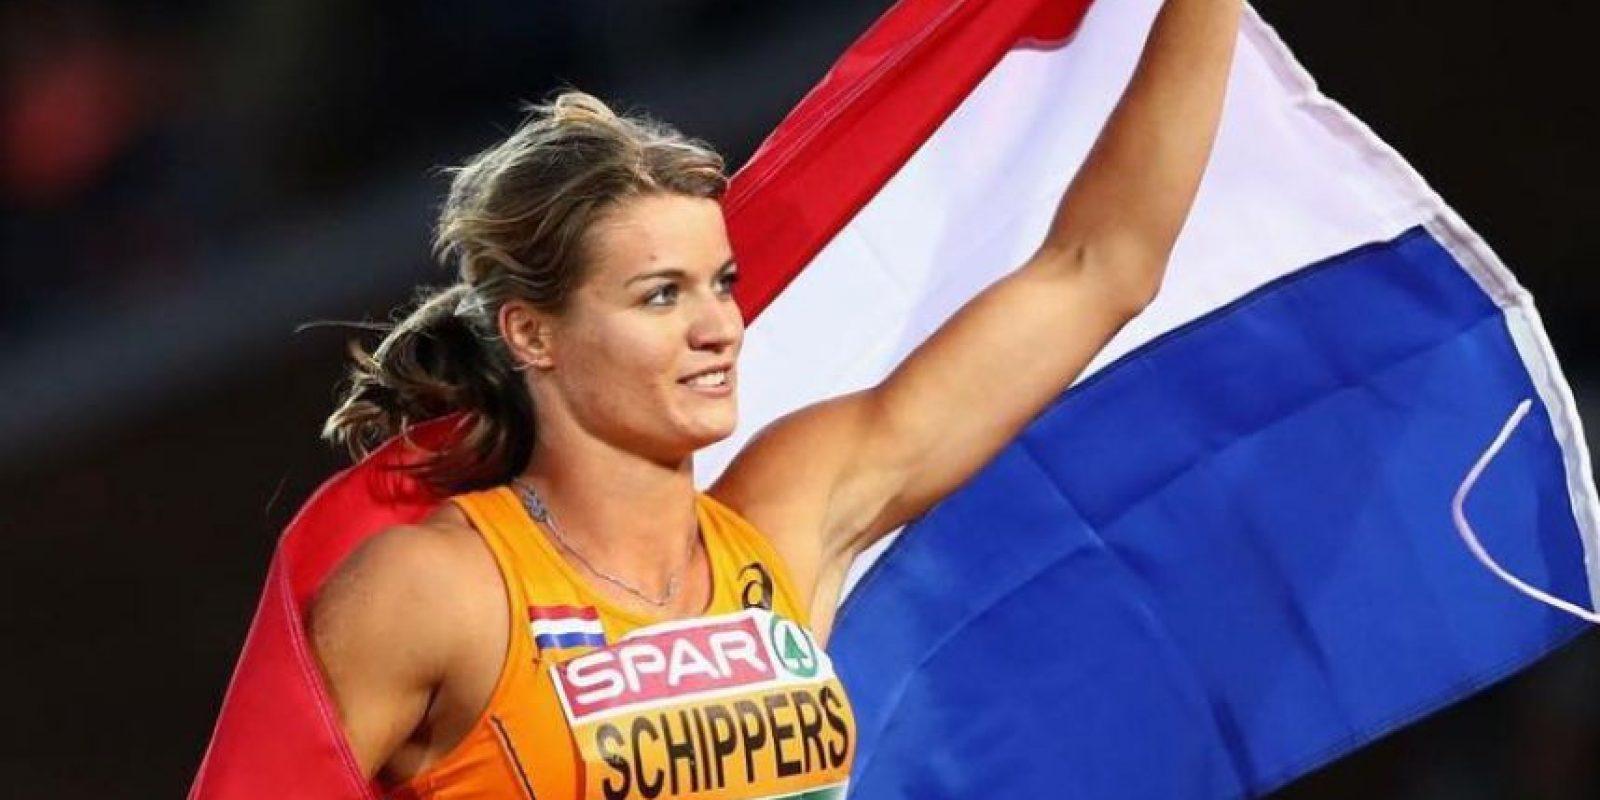 Dafne Schippers (Atletismo / Holanda) Foto:Instagram